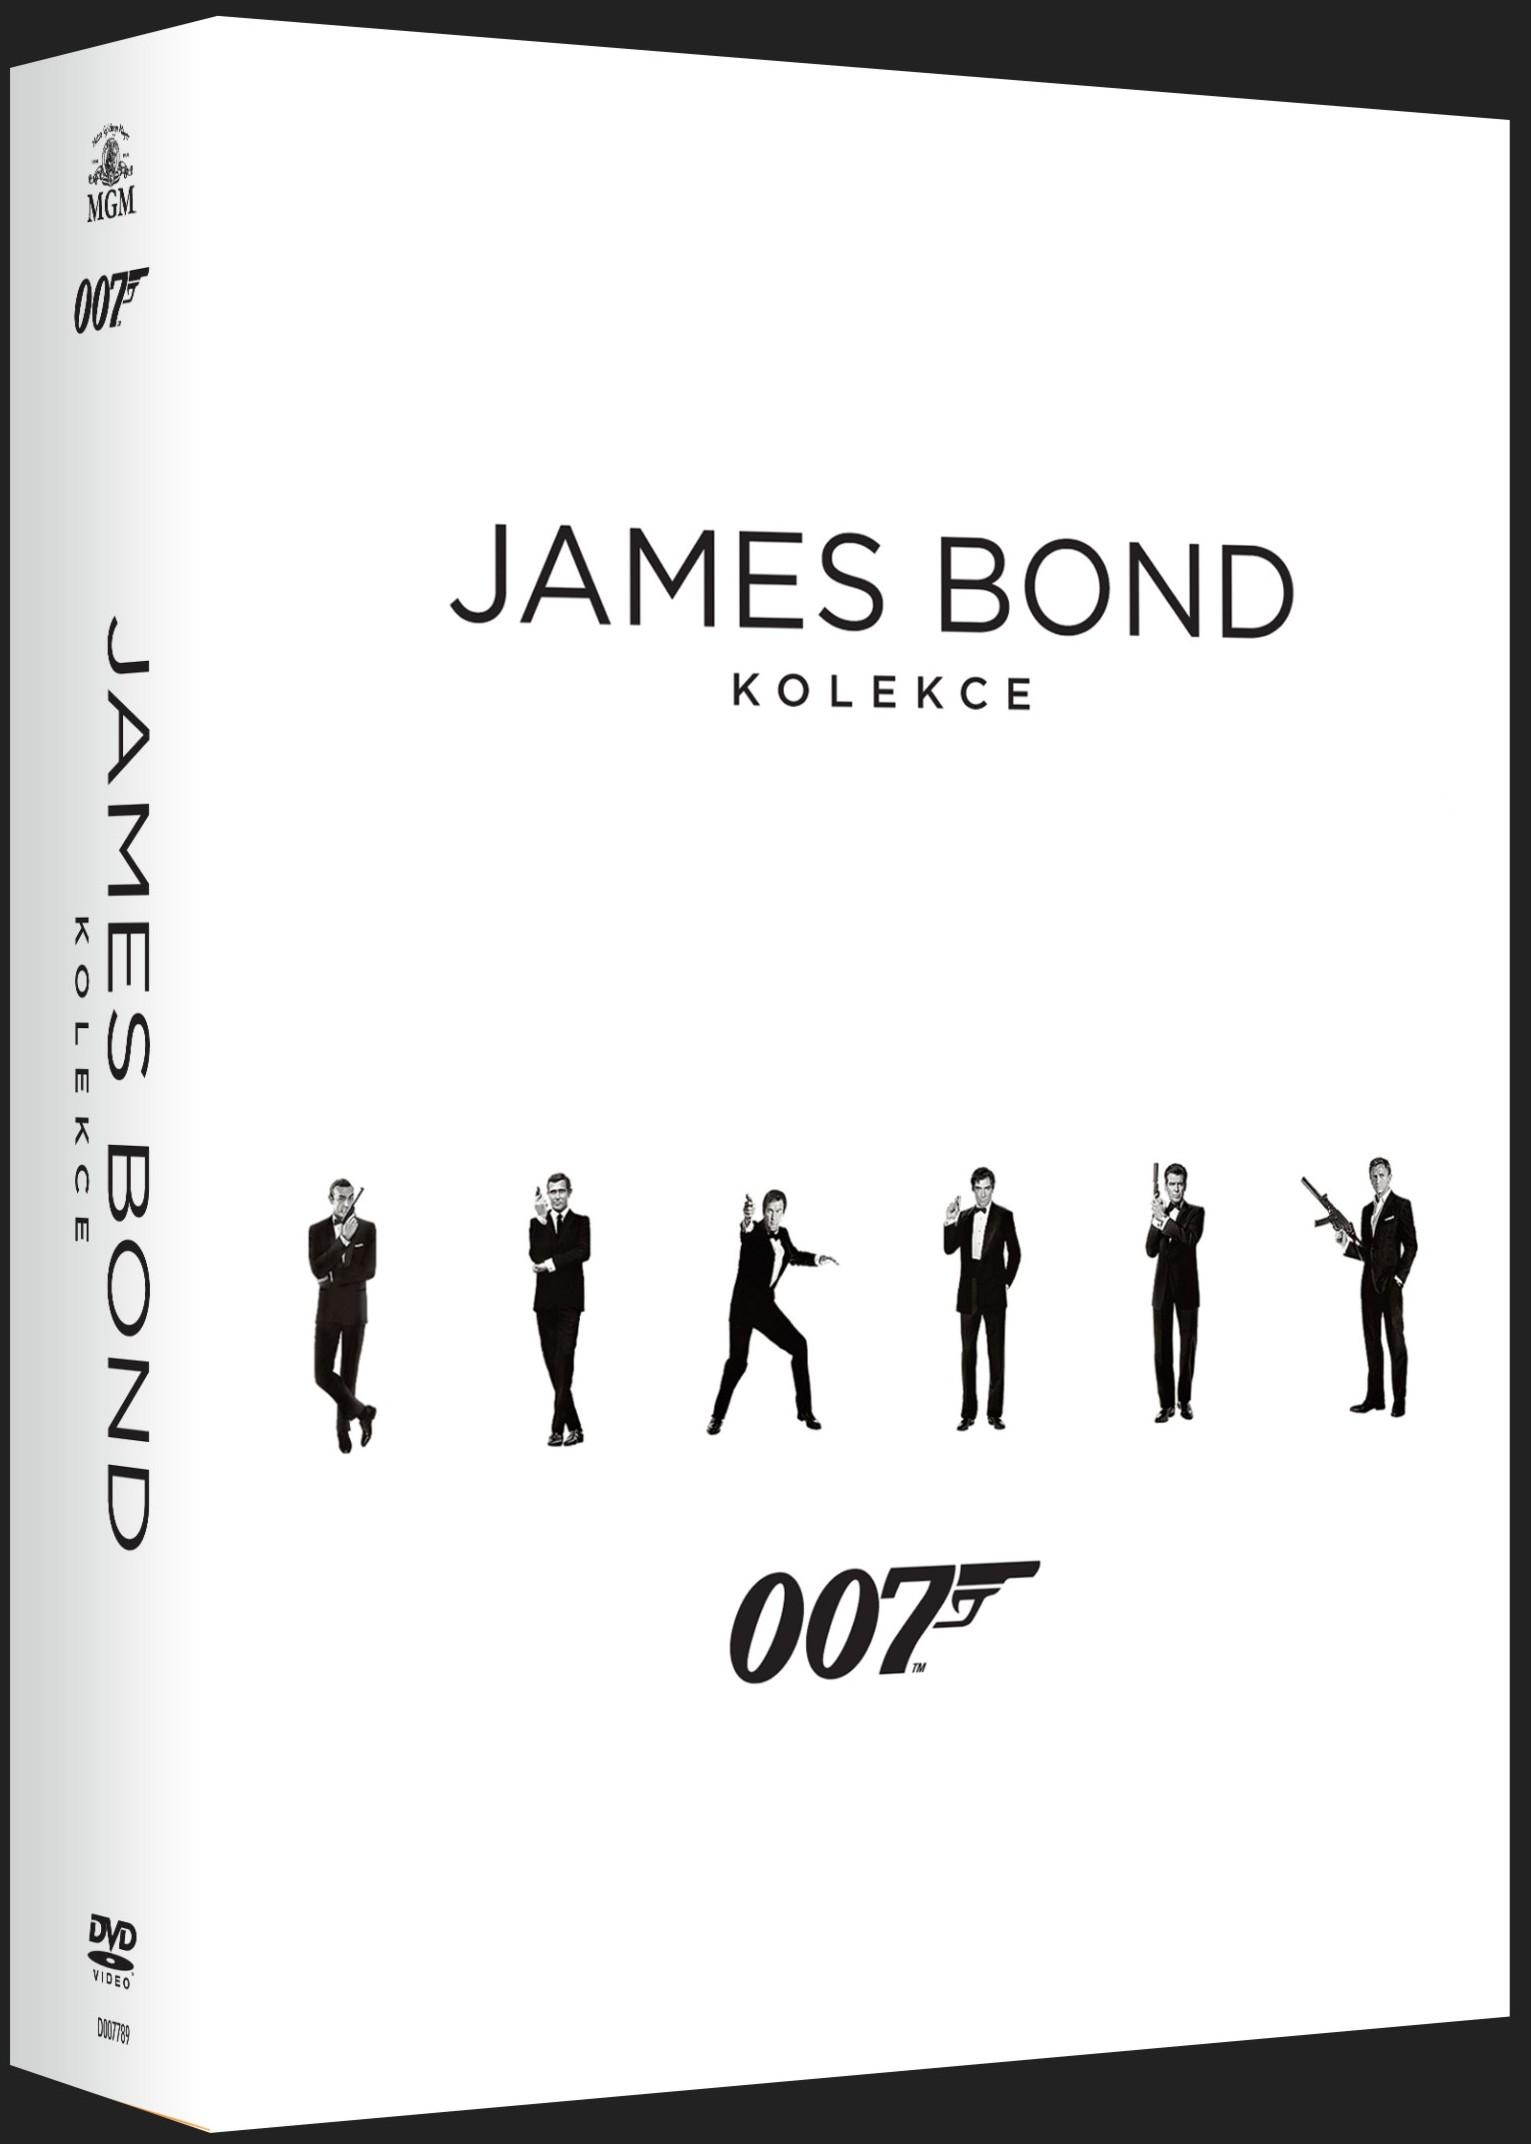 JAMES BOND - KOLEKCE (2016) - 24 DVD